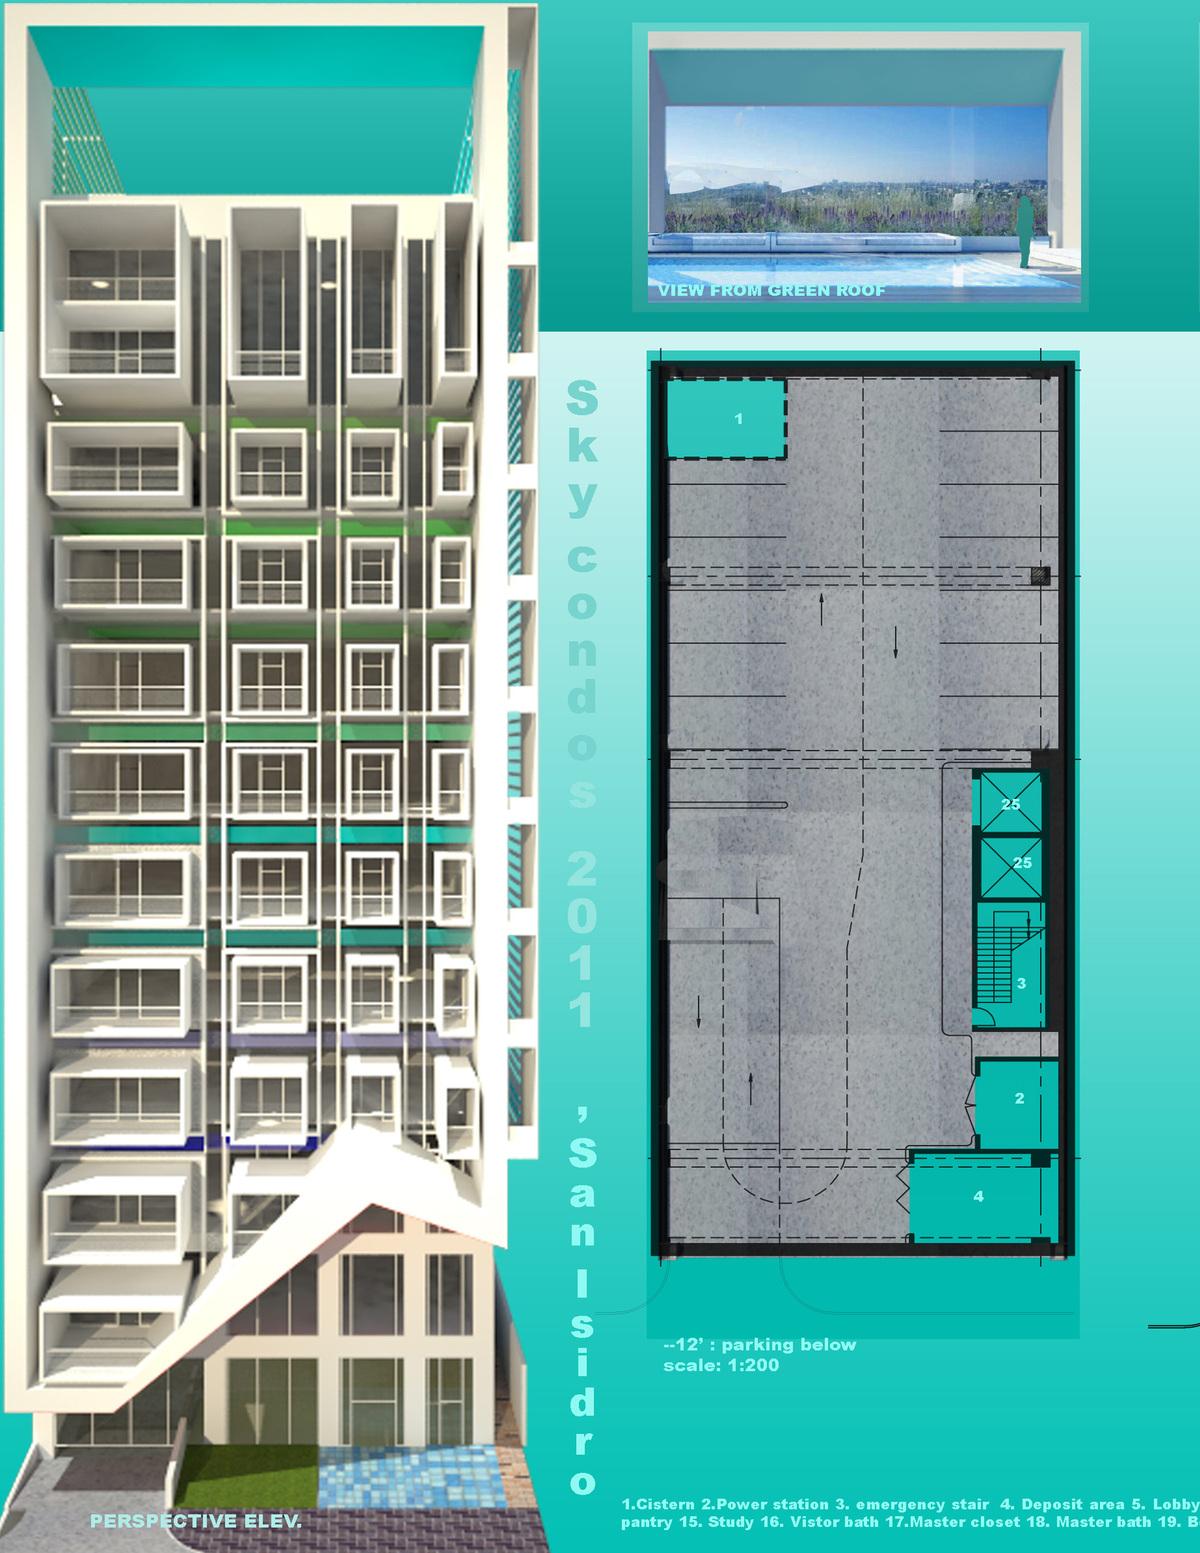 perspective elev., basement plan